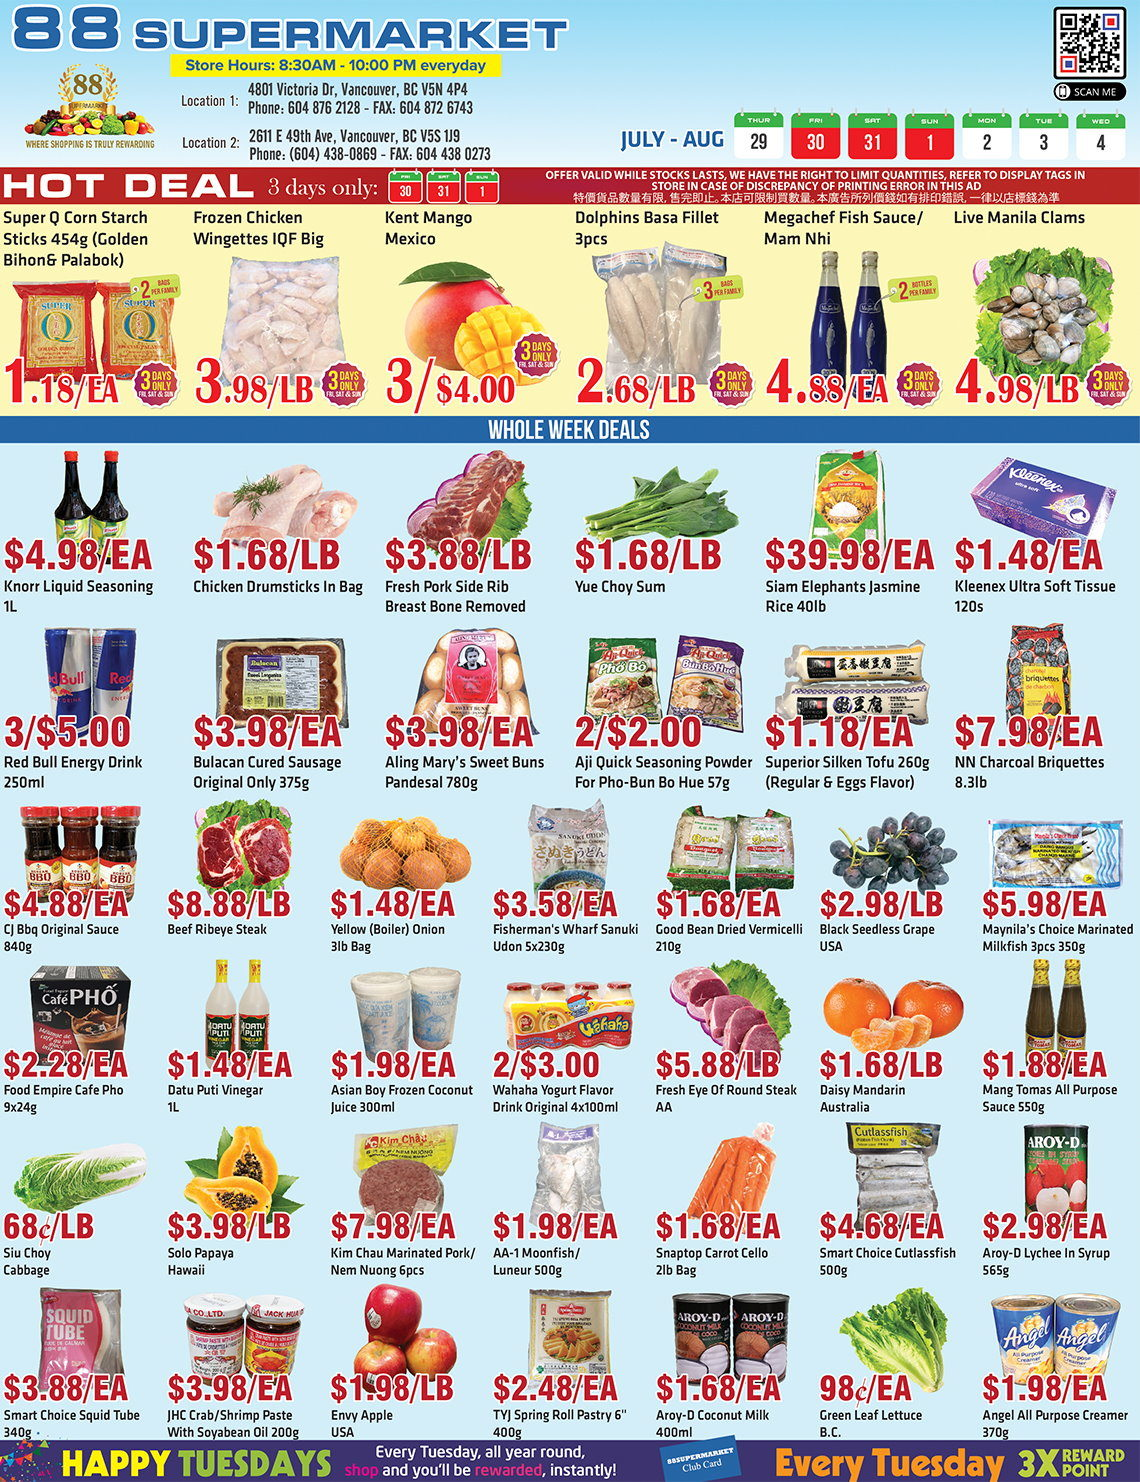 88 Supermarket - Weekly Flyer Specials